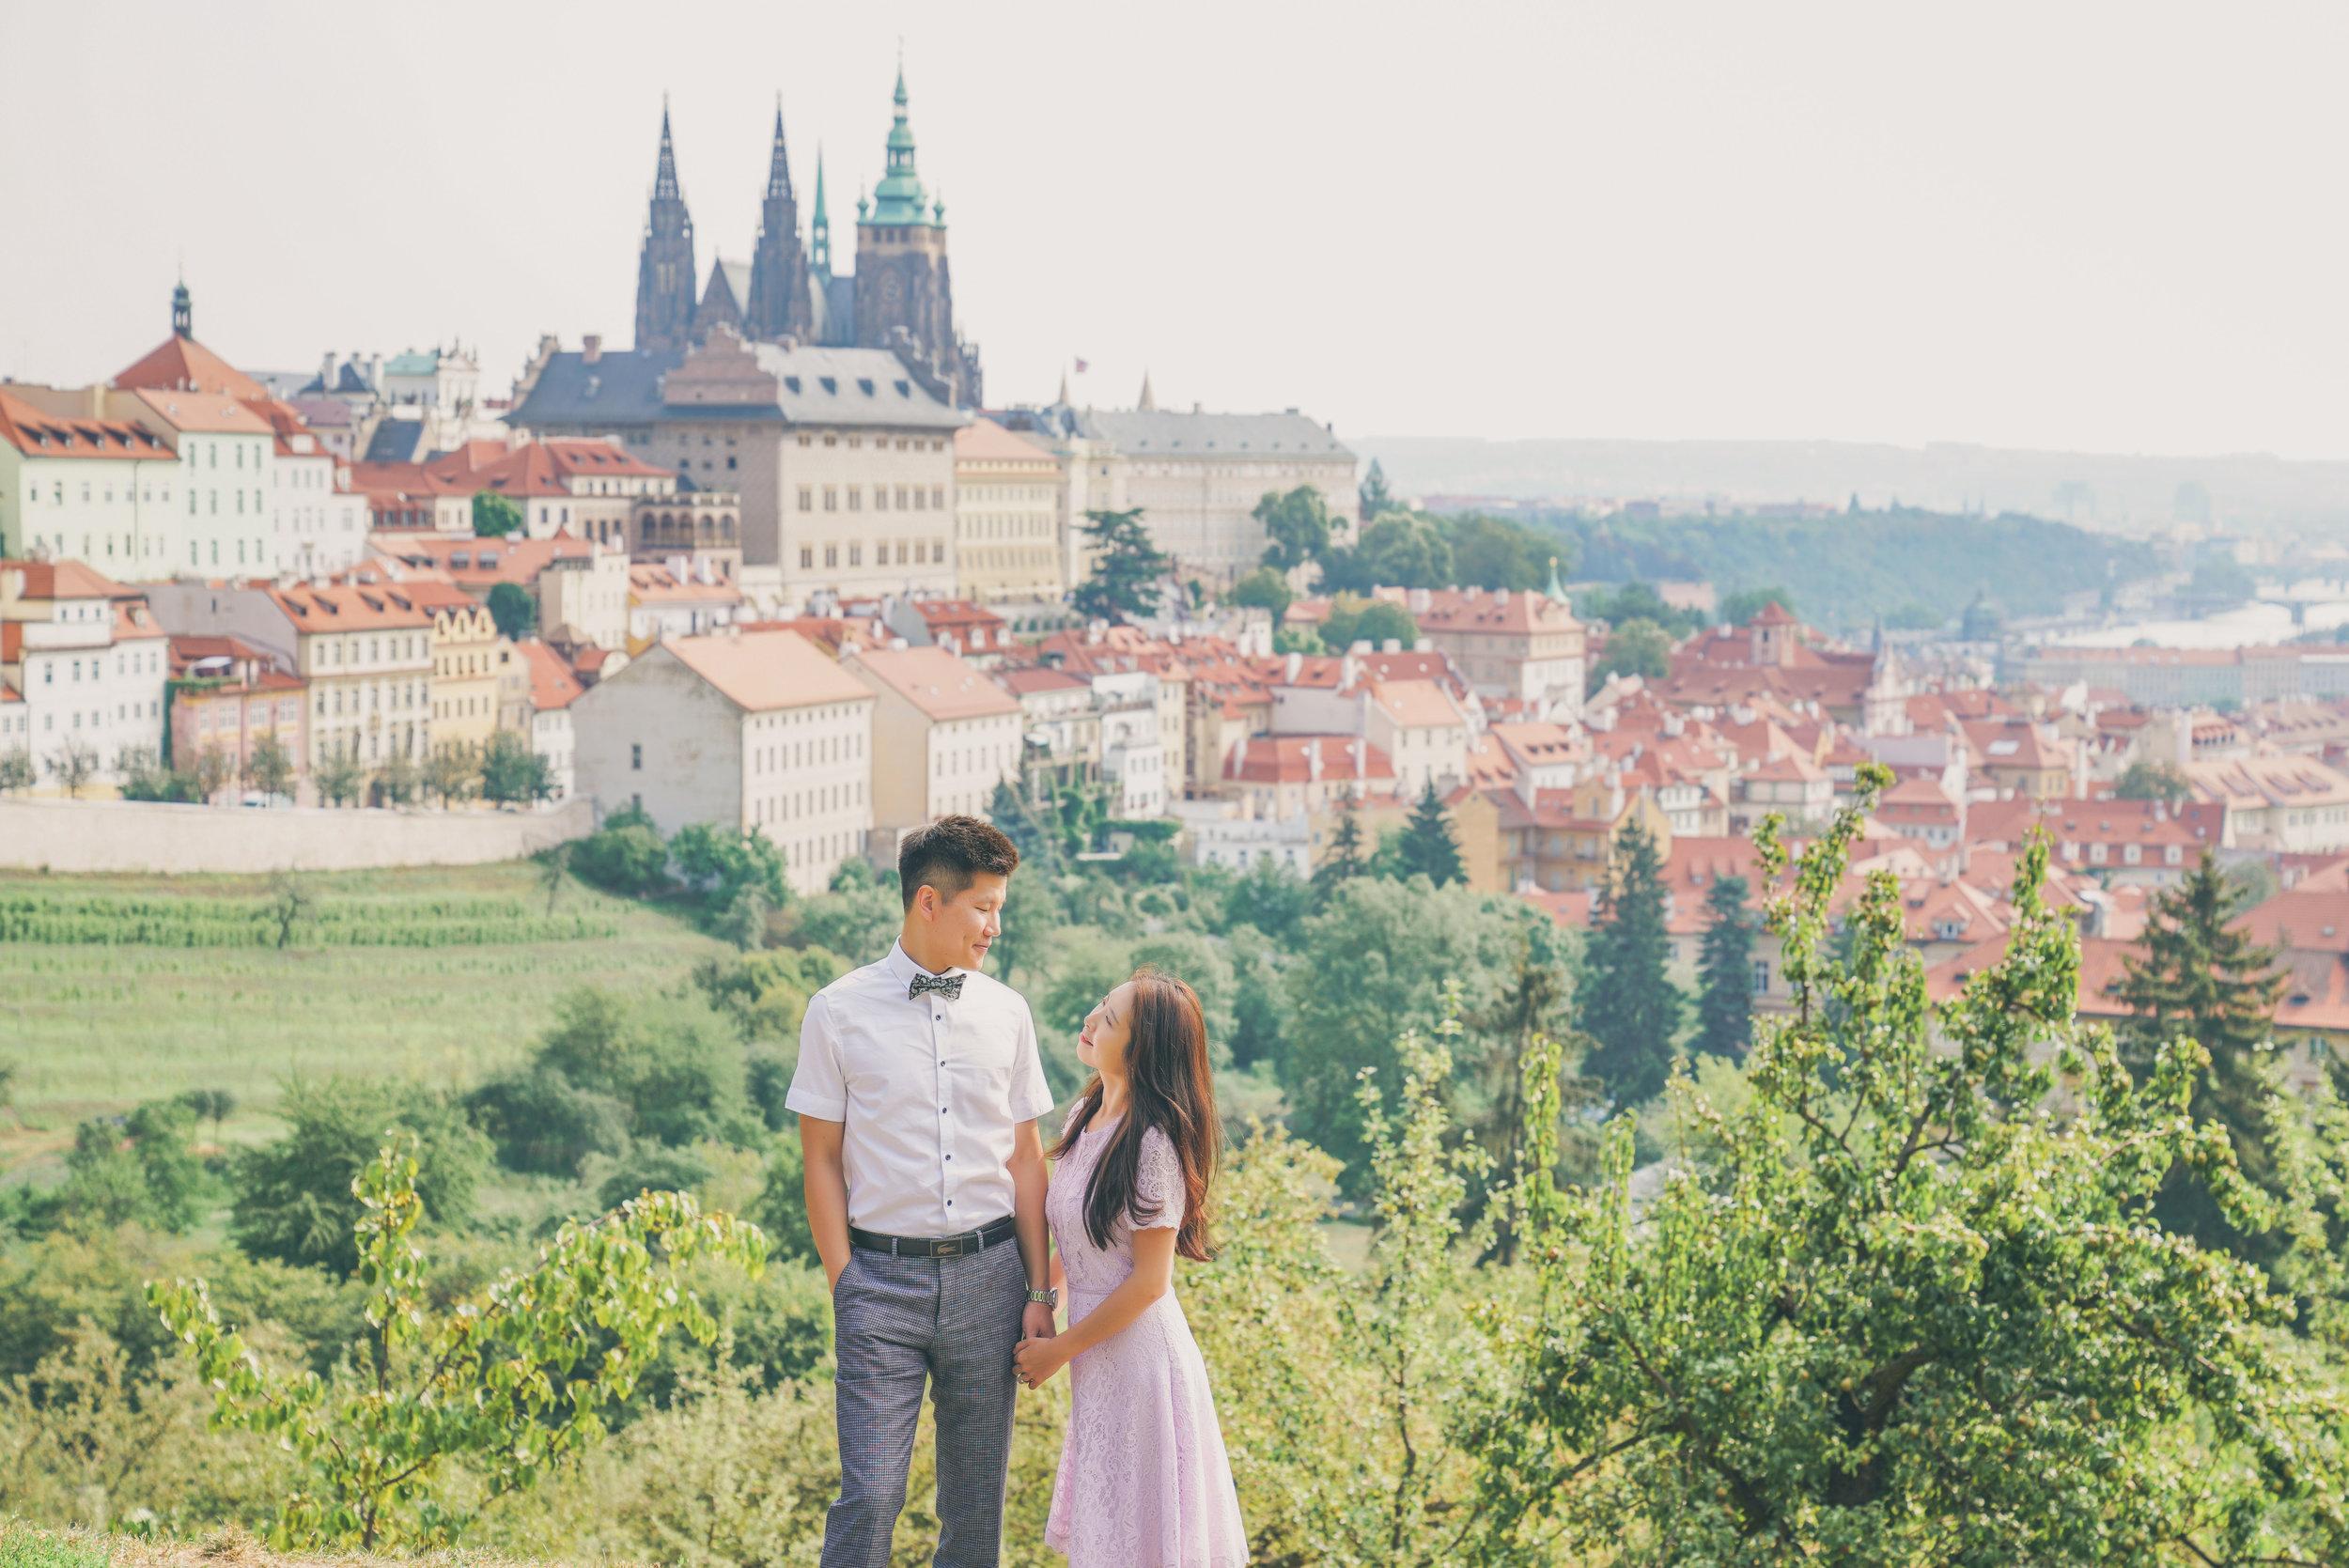 Sprazzi_Professional_Photography_Photographer_Prague_Czech-Republic_Irene_Original_13.jpg